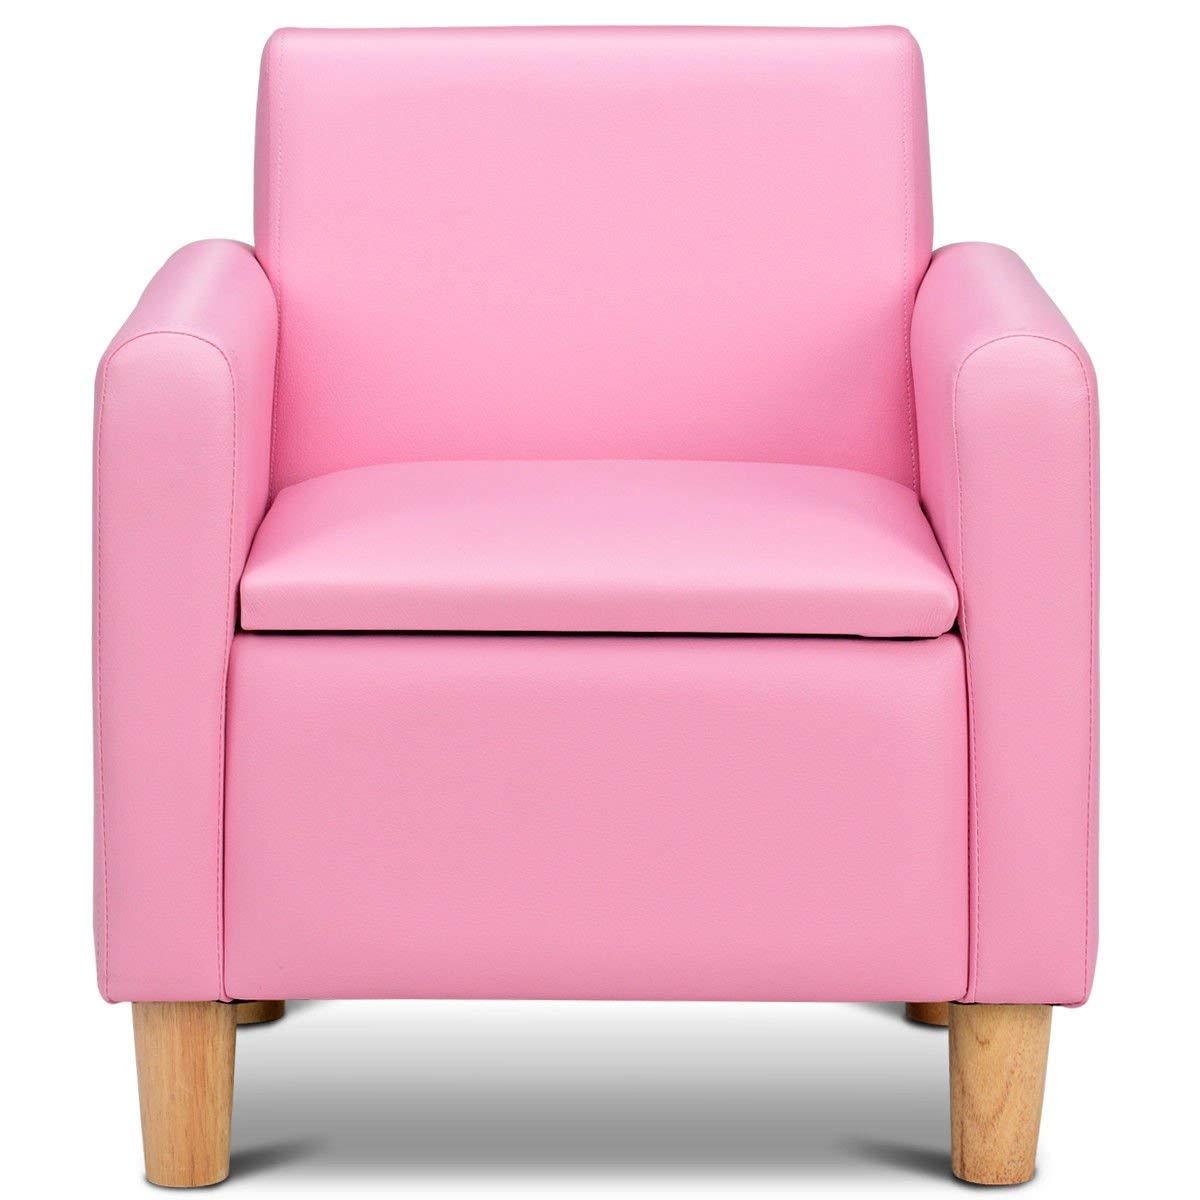 HONEY JOY Kids Sofa, Upholstered Armrest, Sturdy Wood Construction, Toddler Couch with Storage Box (Single Seat, Pink) by HONEY JOY (Image #2)